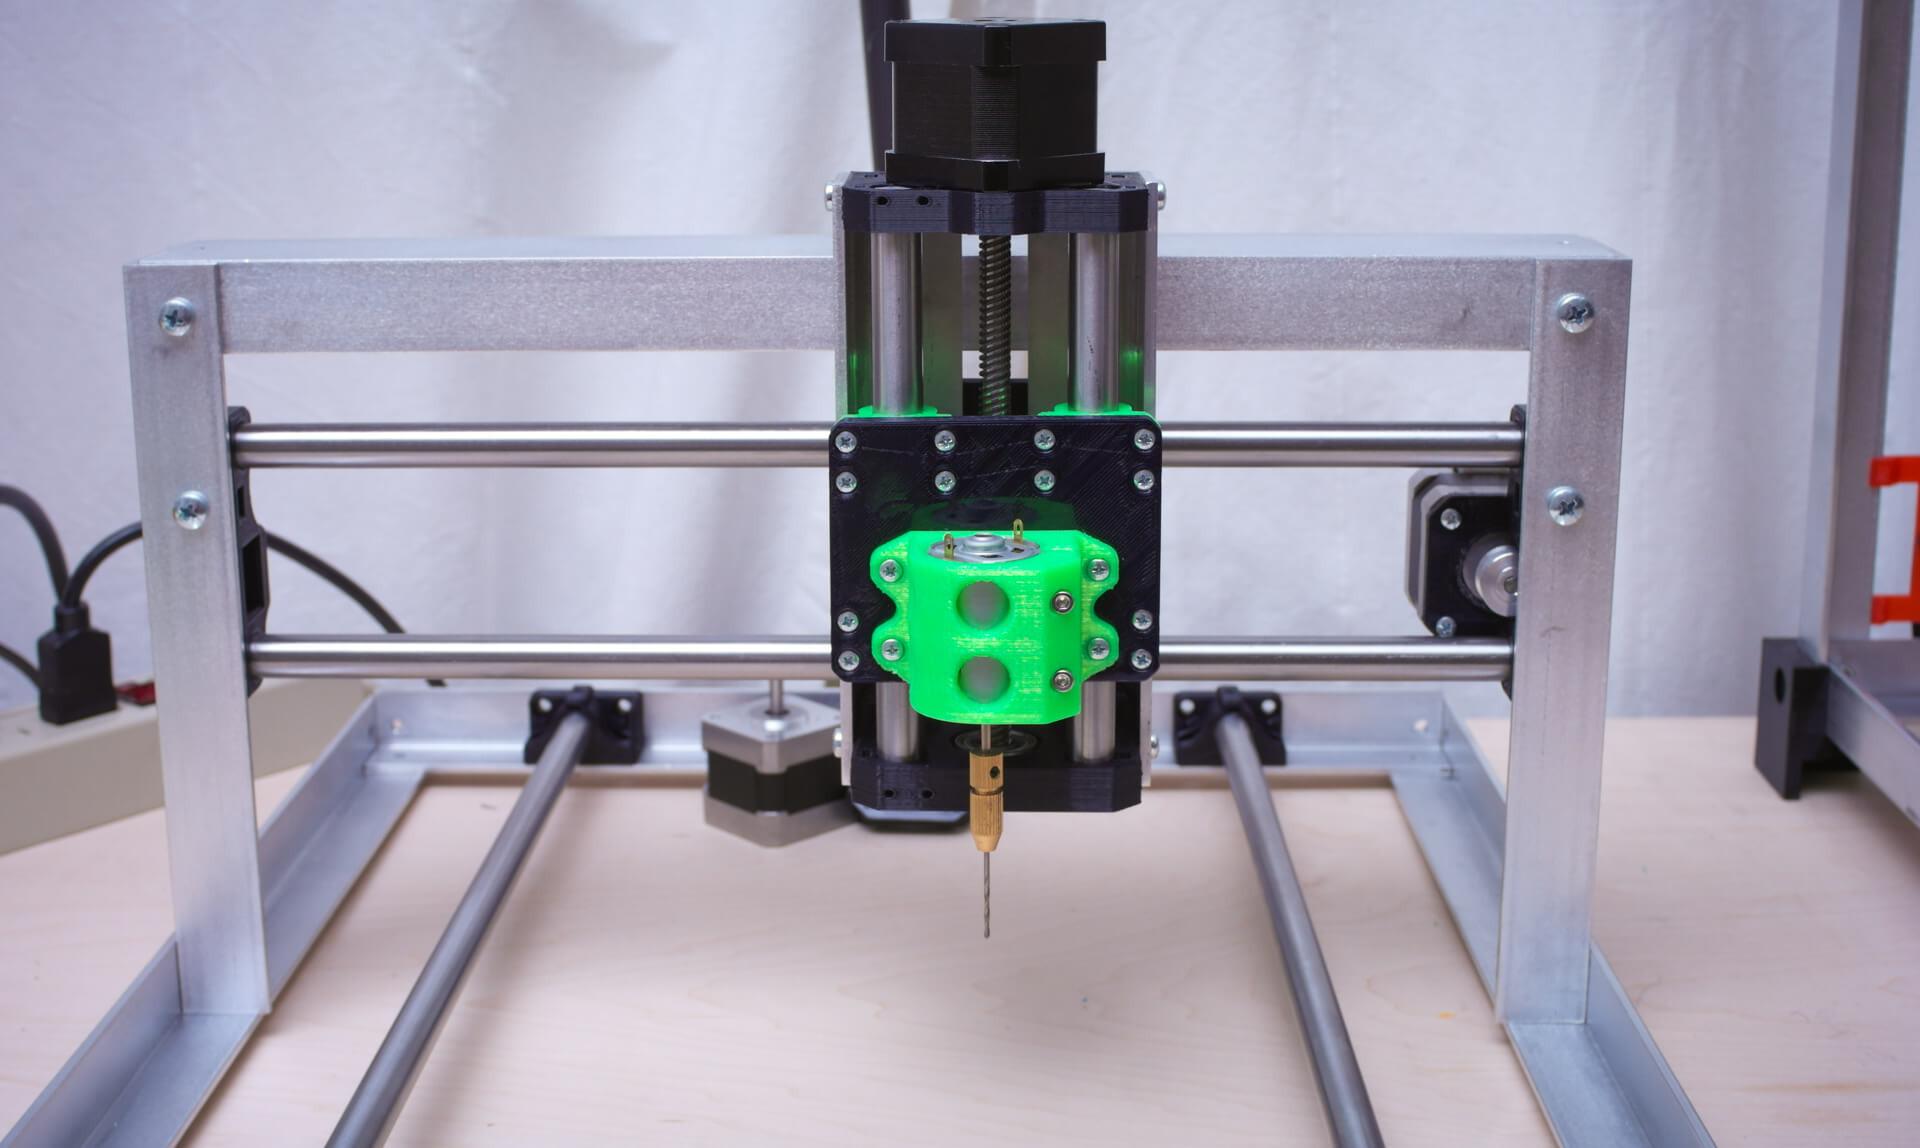 Best ideas about DIY Cnc Machine . Save or Pin A DIY CNC Machine The DIY Dudes Rift Now.